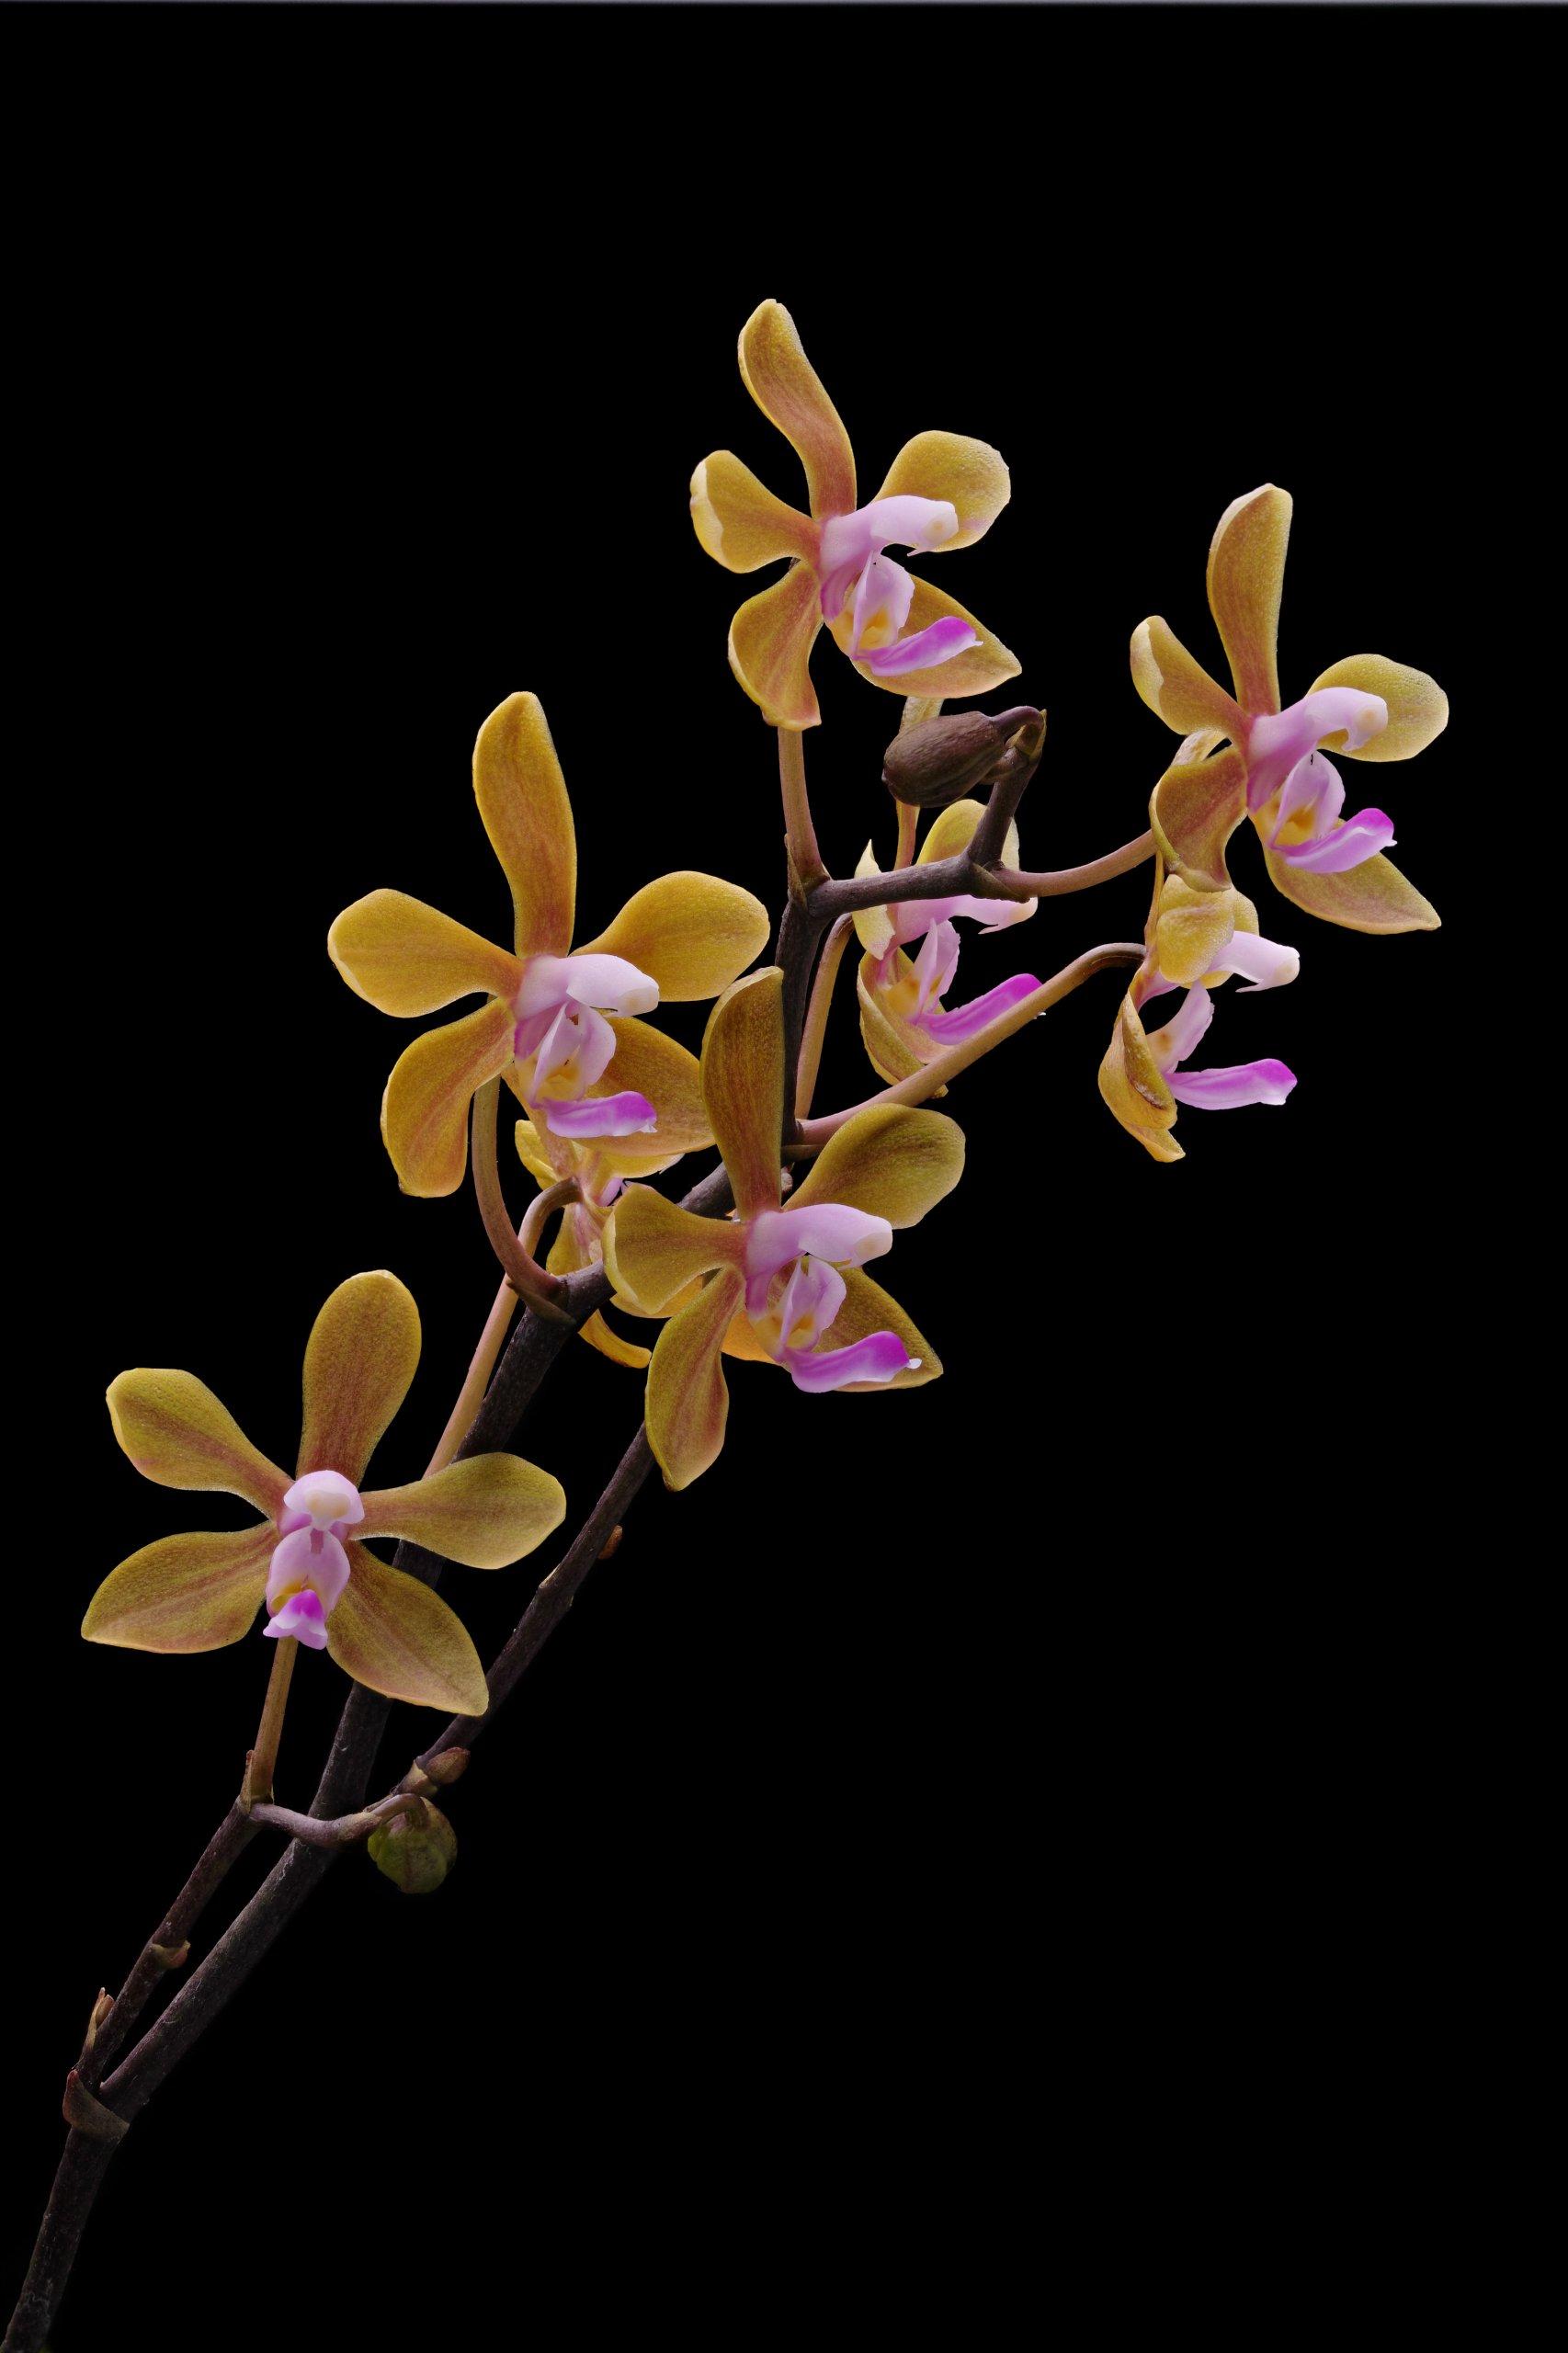 Phalaenopsis hainanensis_flowers 01.jpg